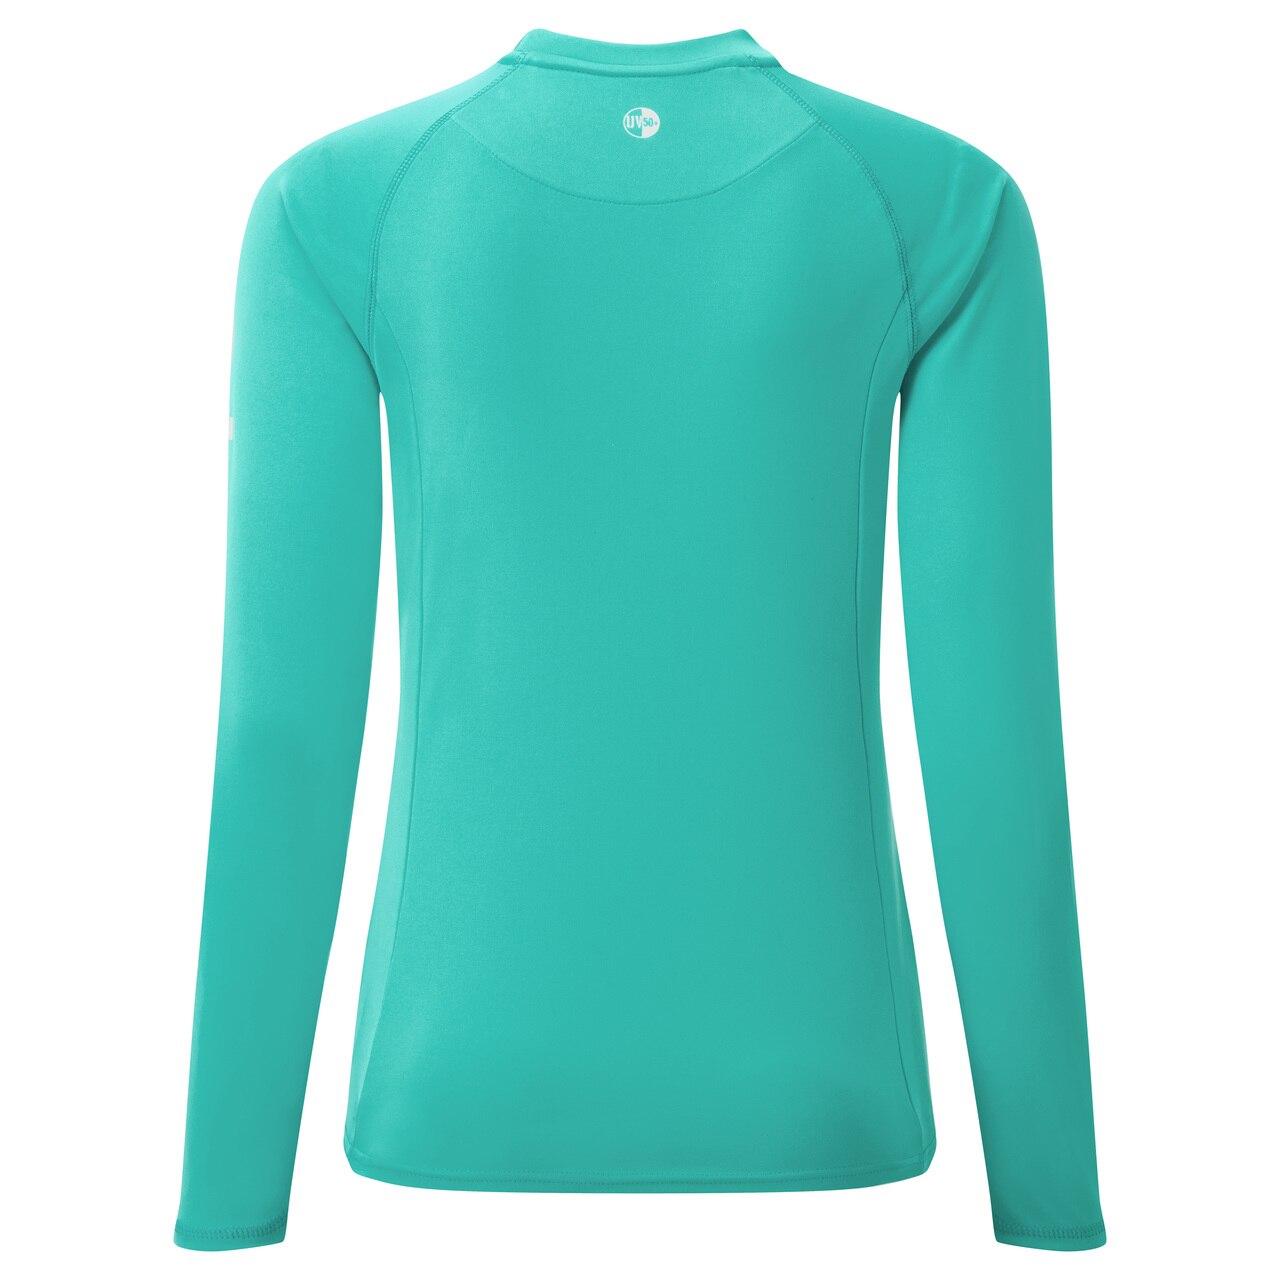 Women's UV Tec Long Sleeve Tee - UV011W-TUR02-3.jpg